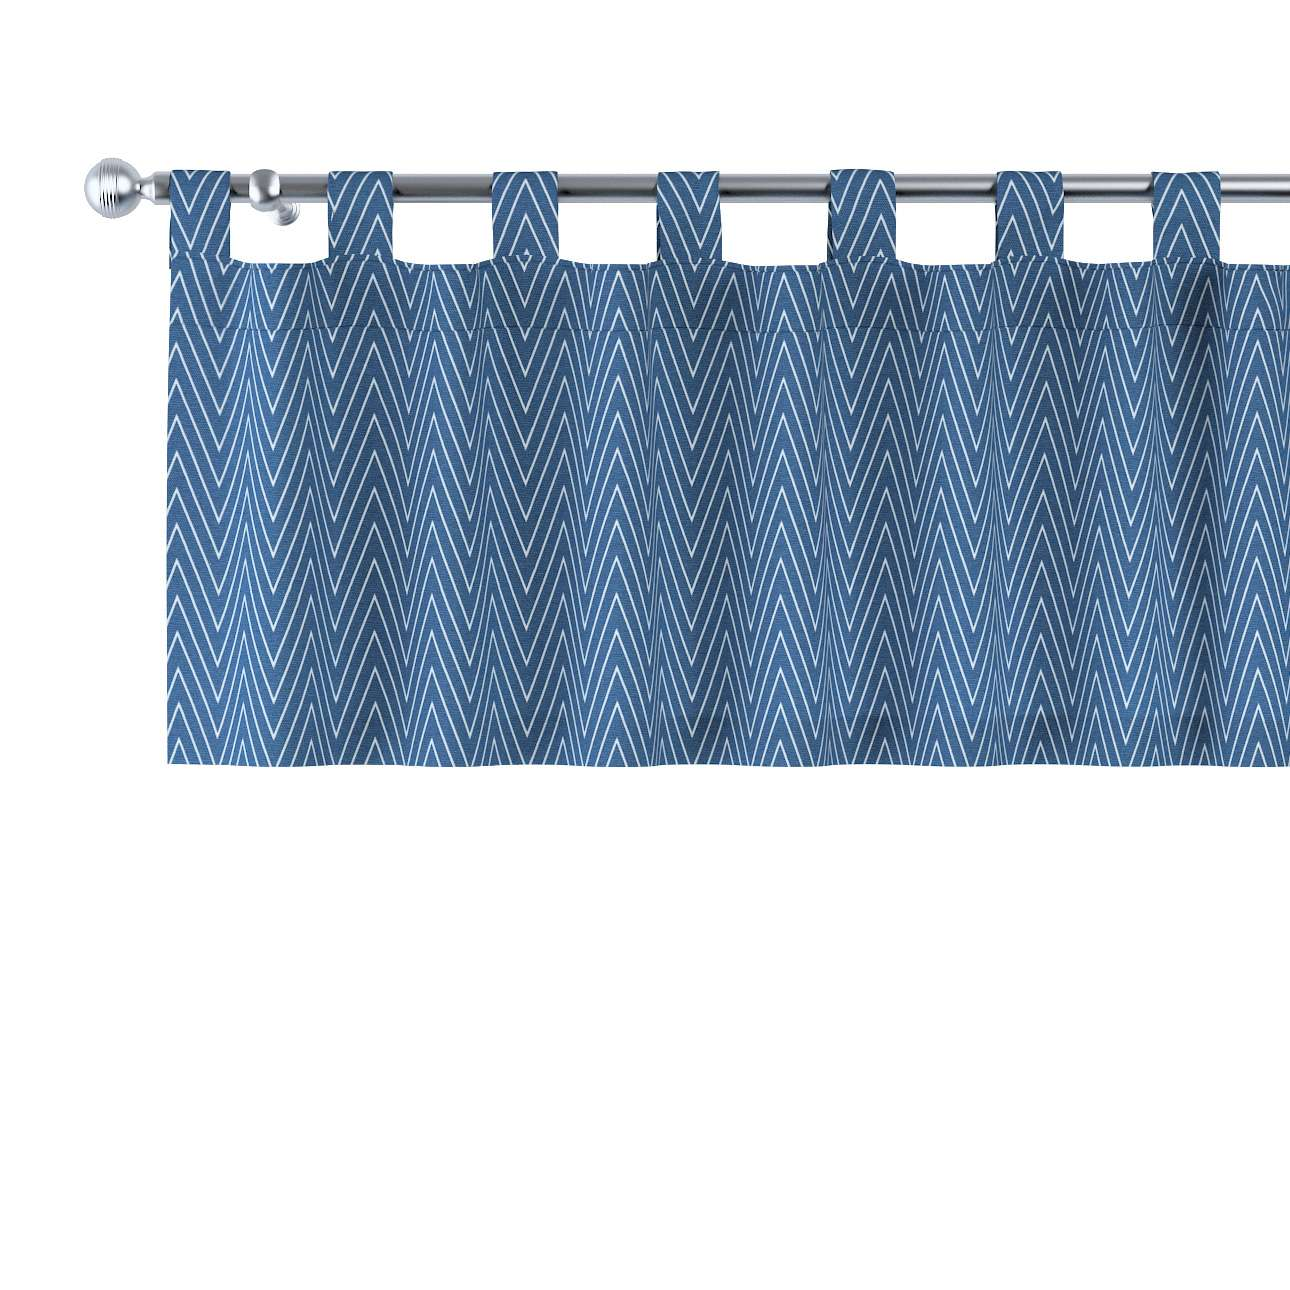 Gardinkappe med stropper 130x40cm fra kollektionen Brooklyn, Stof: 137-88